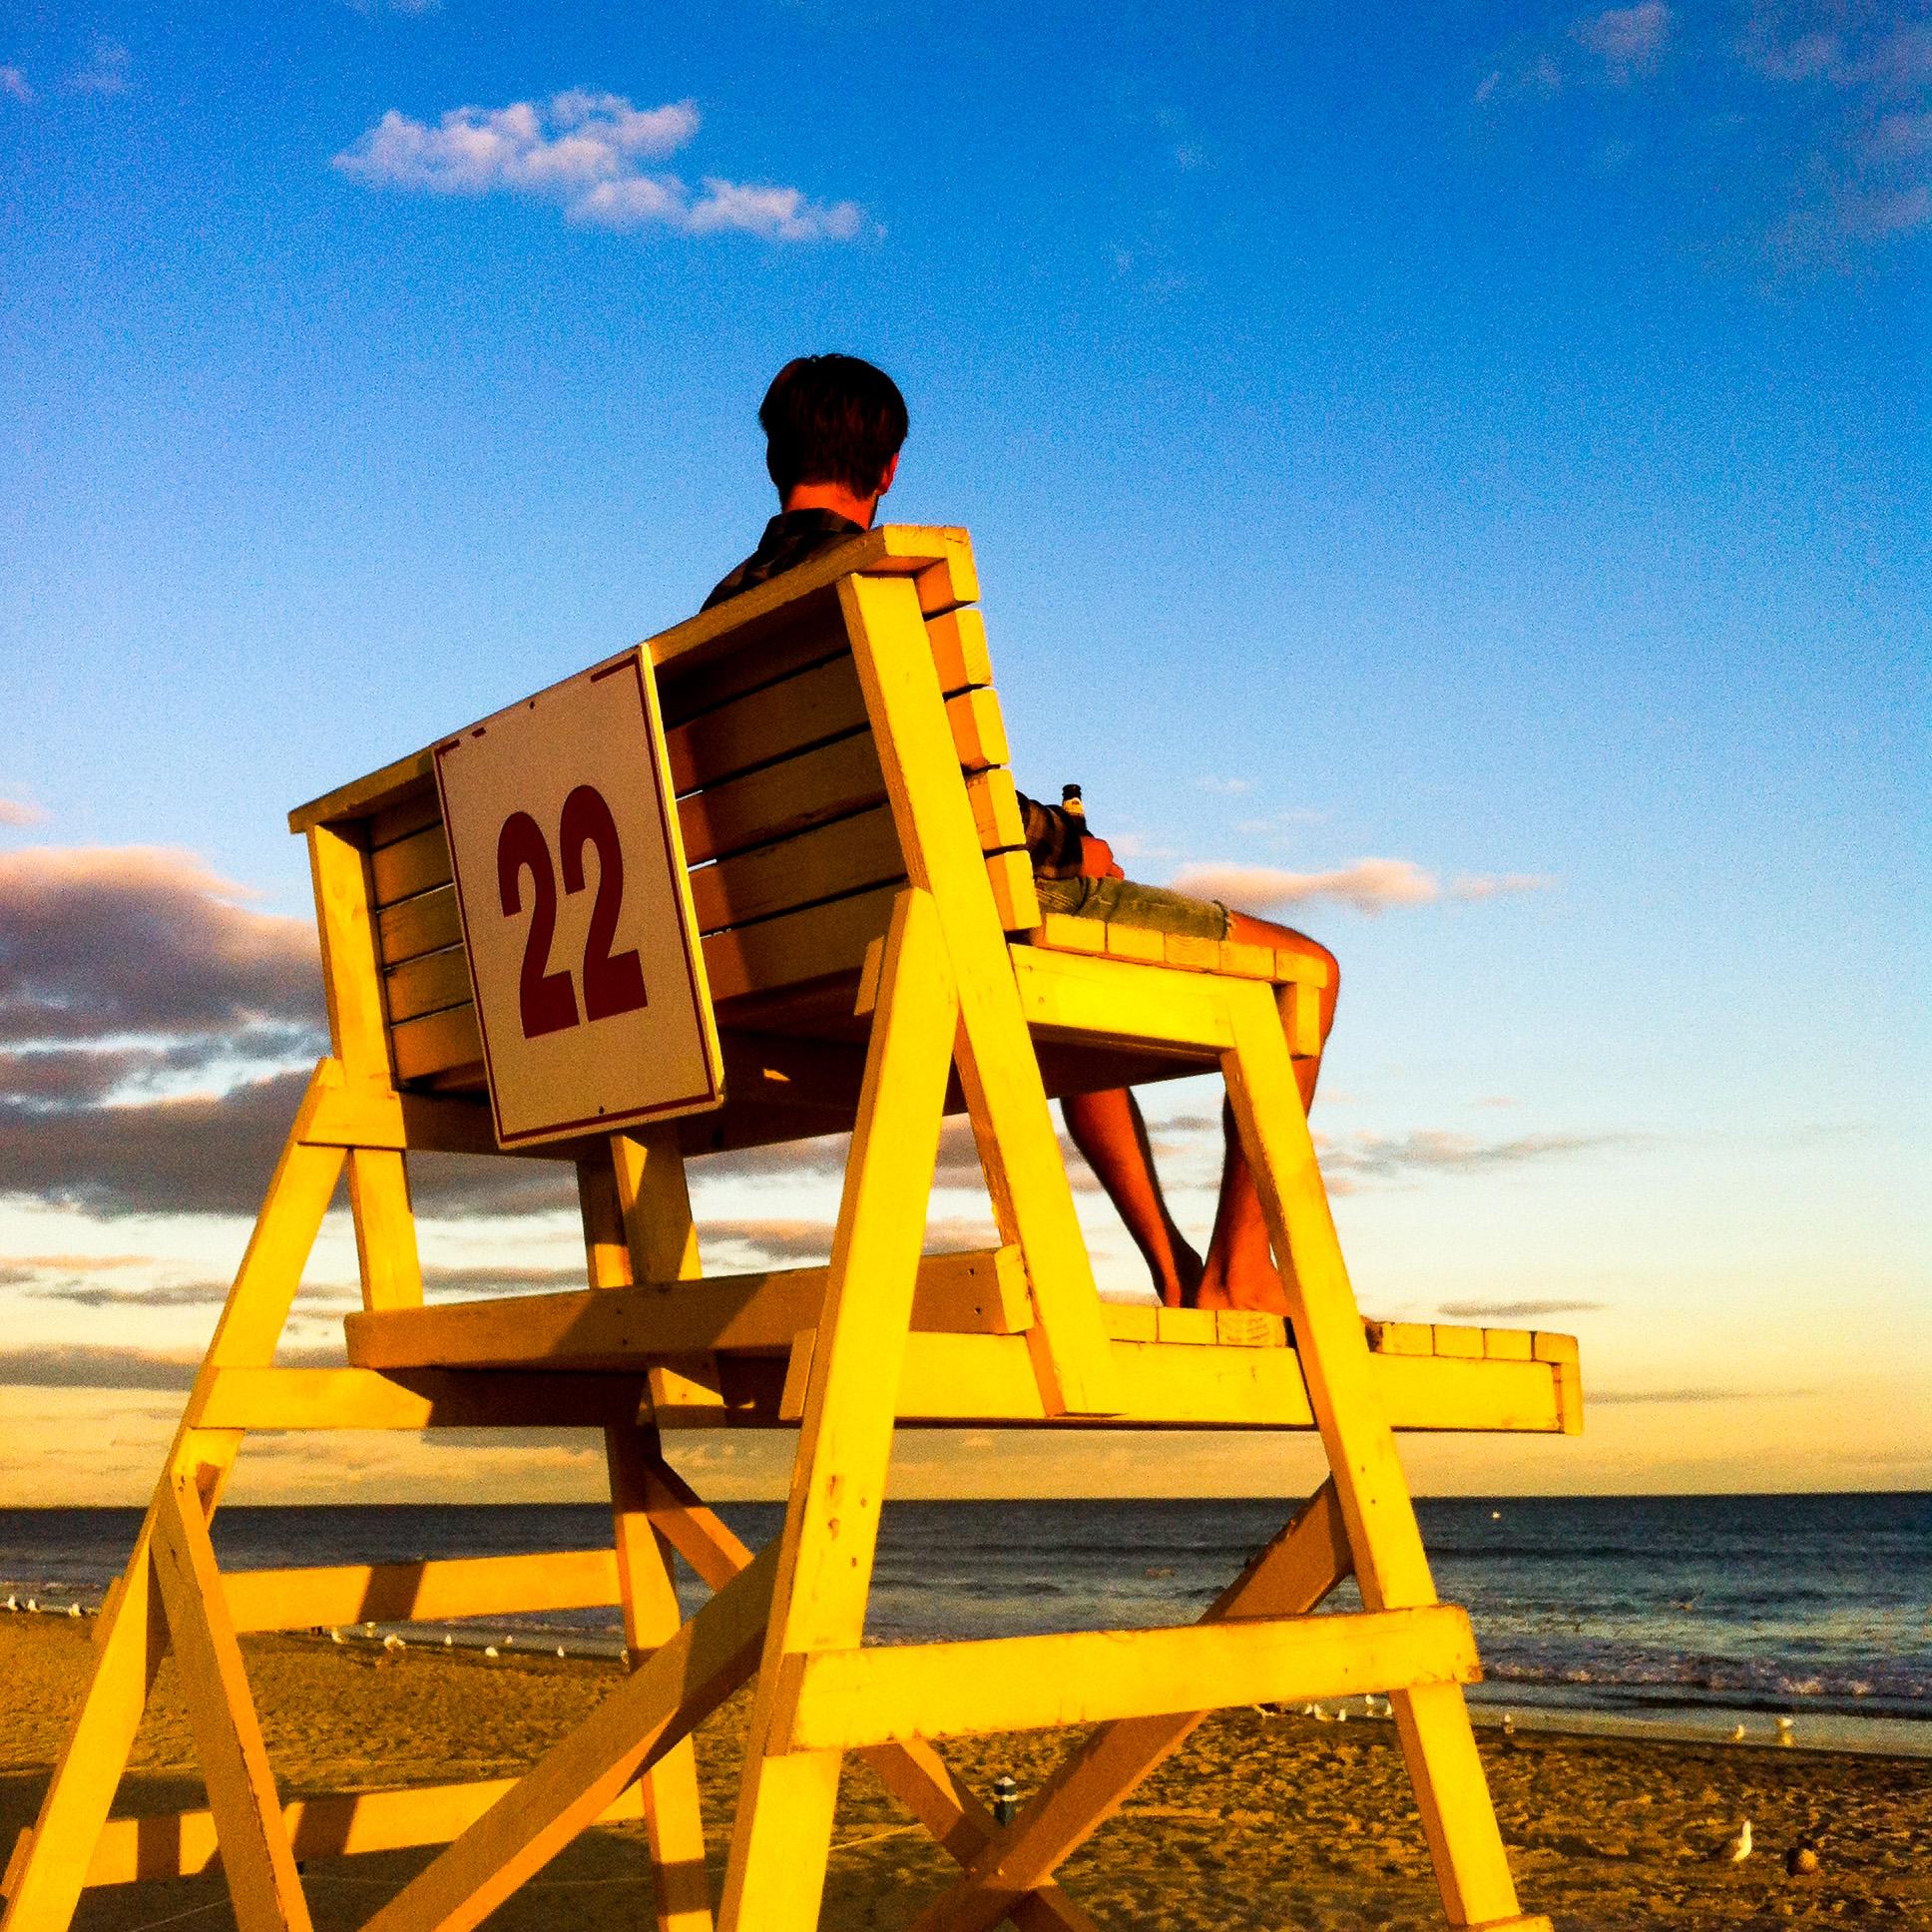 jim-lifestand-alue-optics-long-beach-ny.jpg